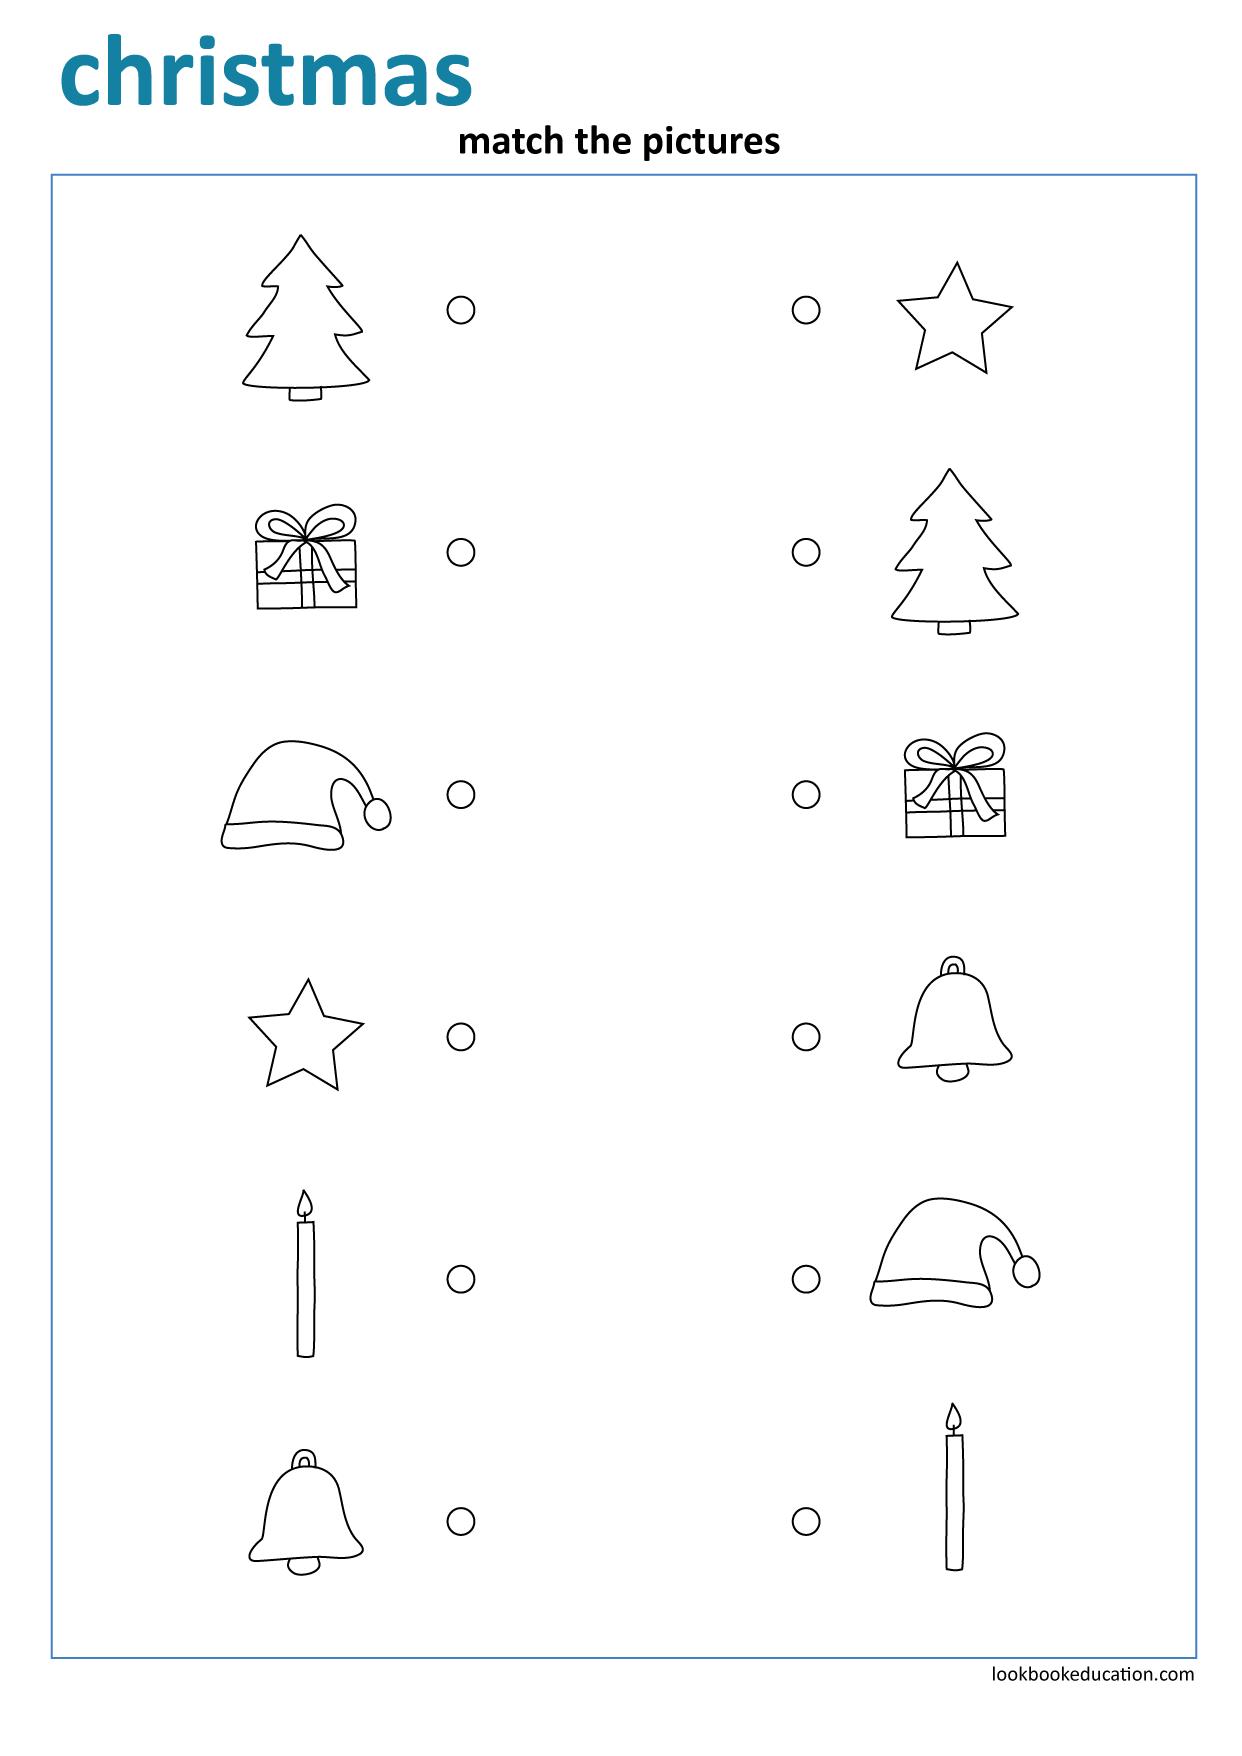 Worksheet Christmas Matching | Christmas Worksheets